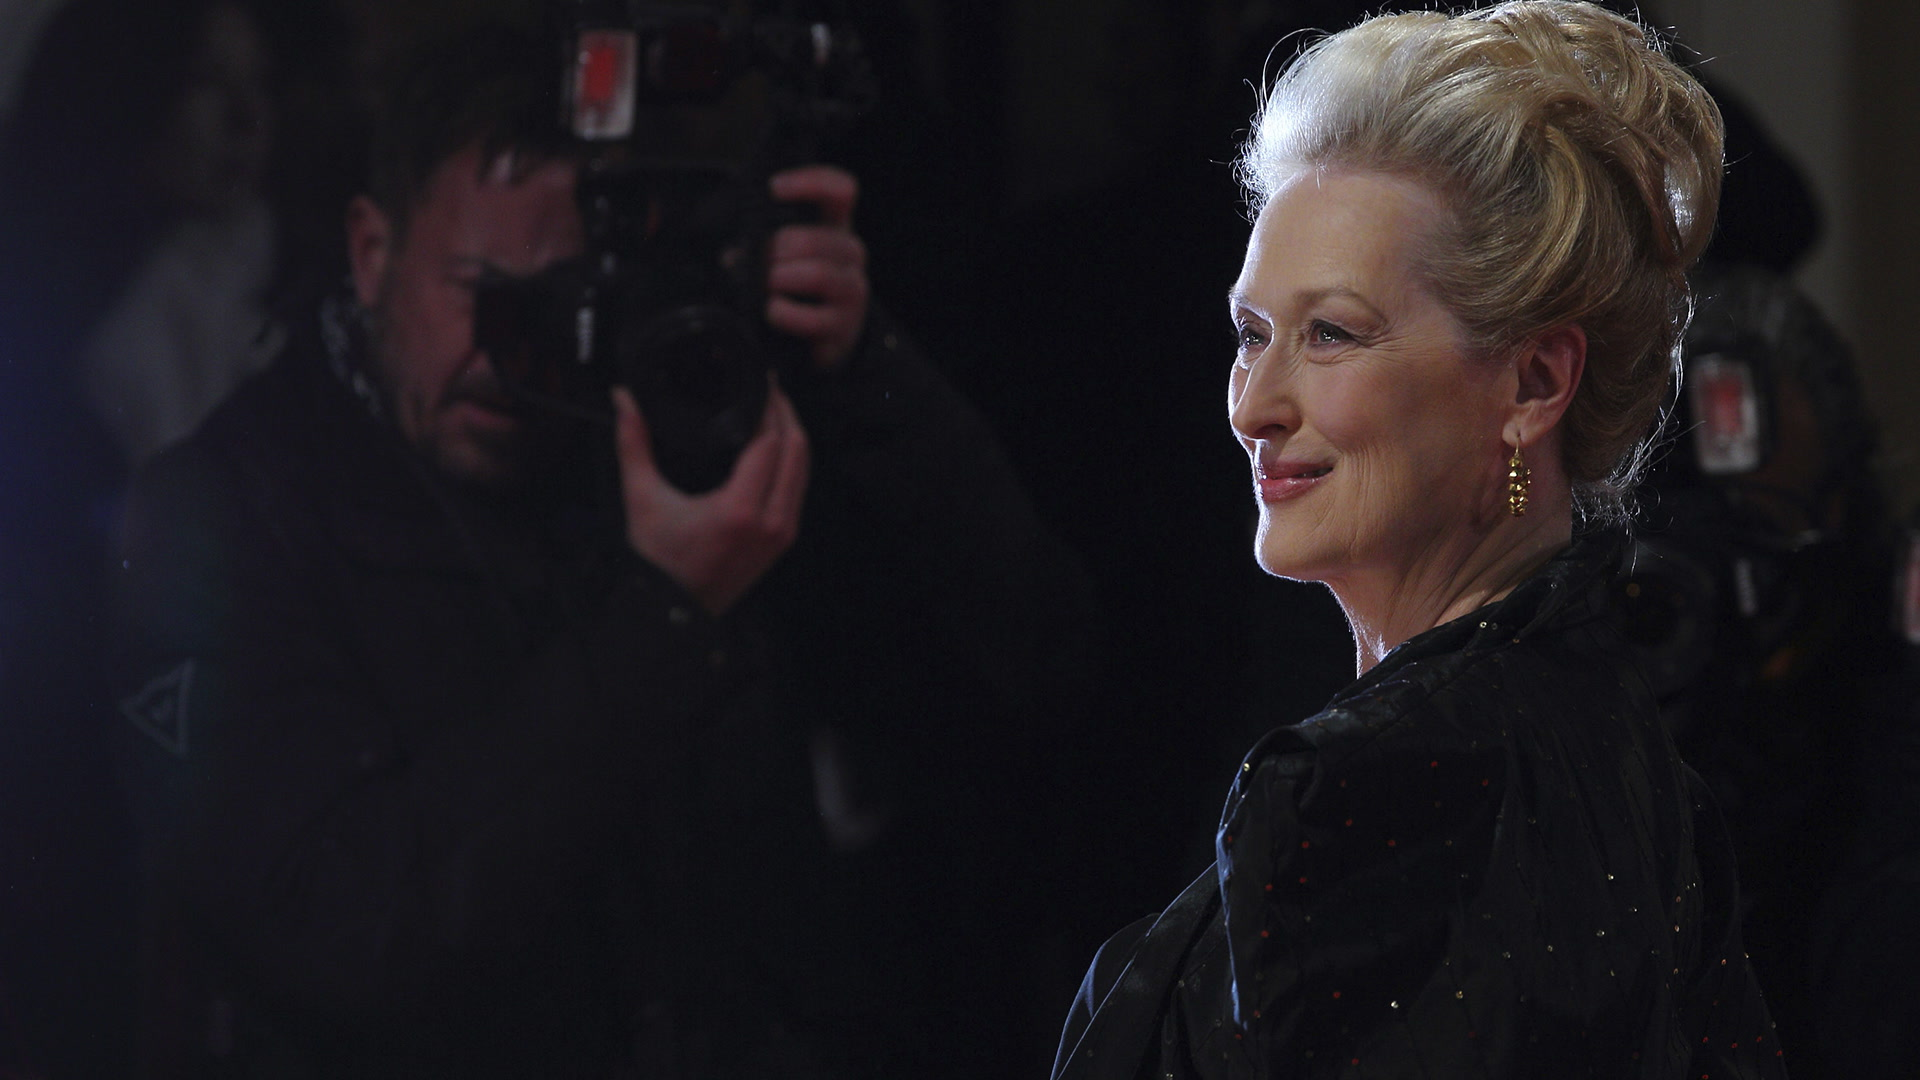 Meryl Streep, una diva del cine